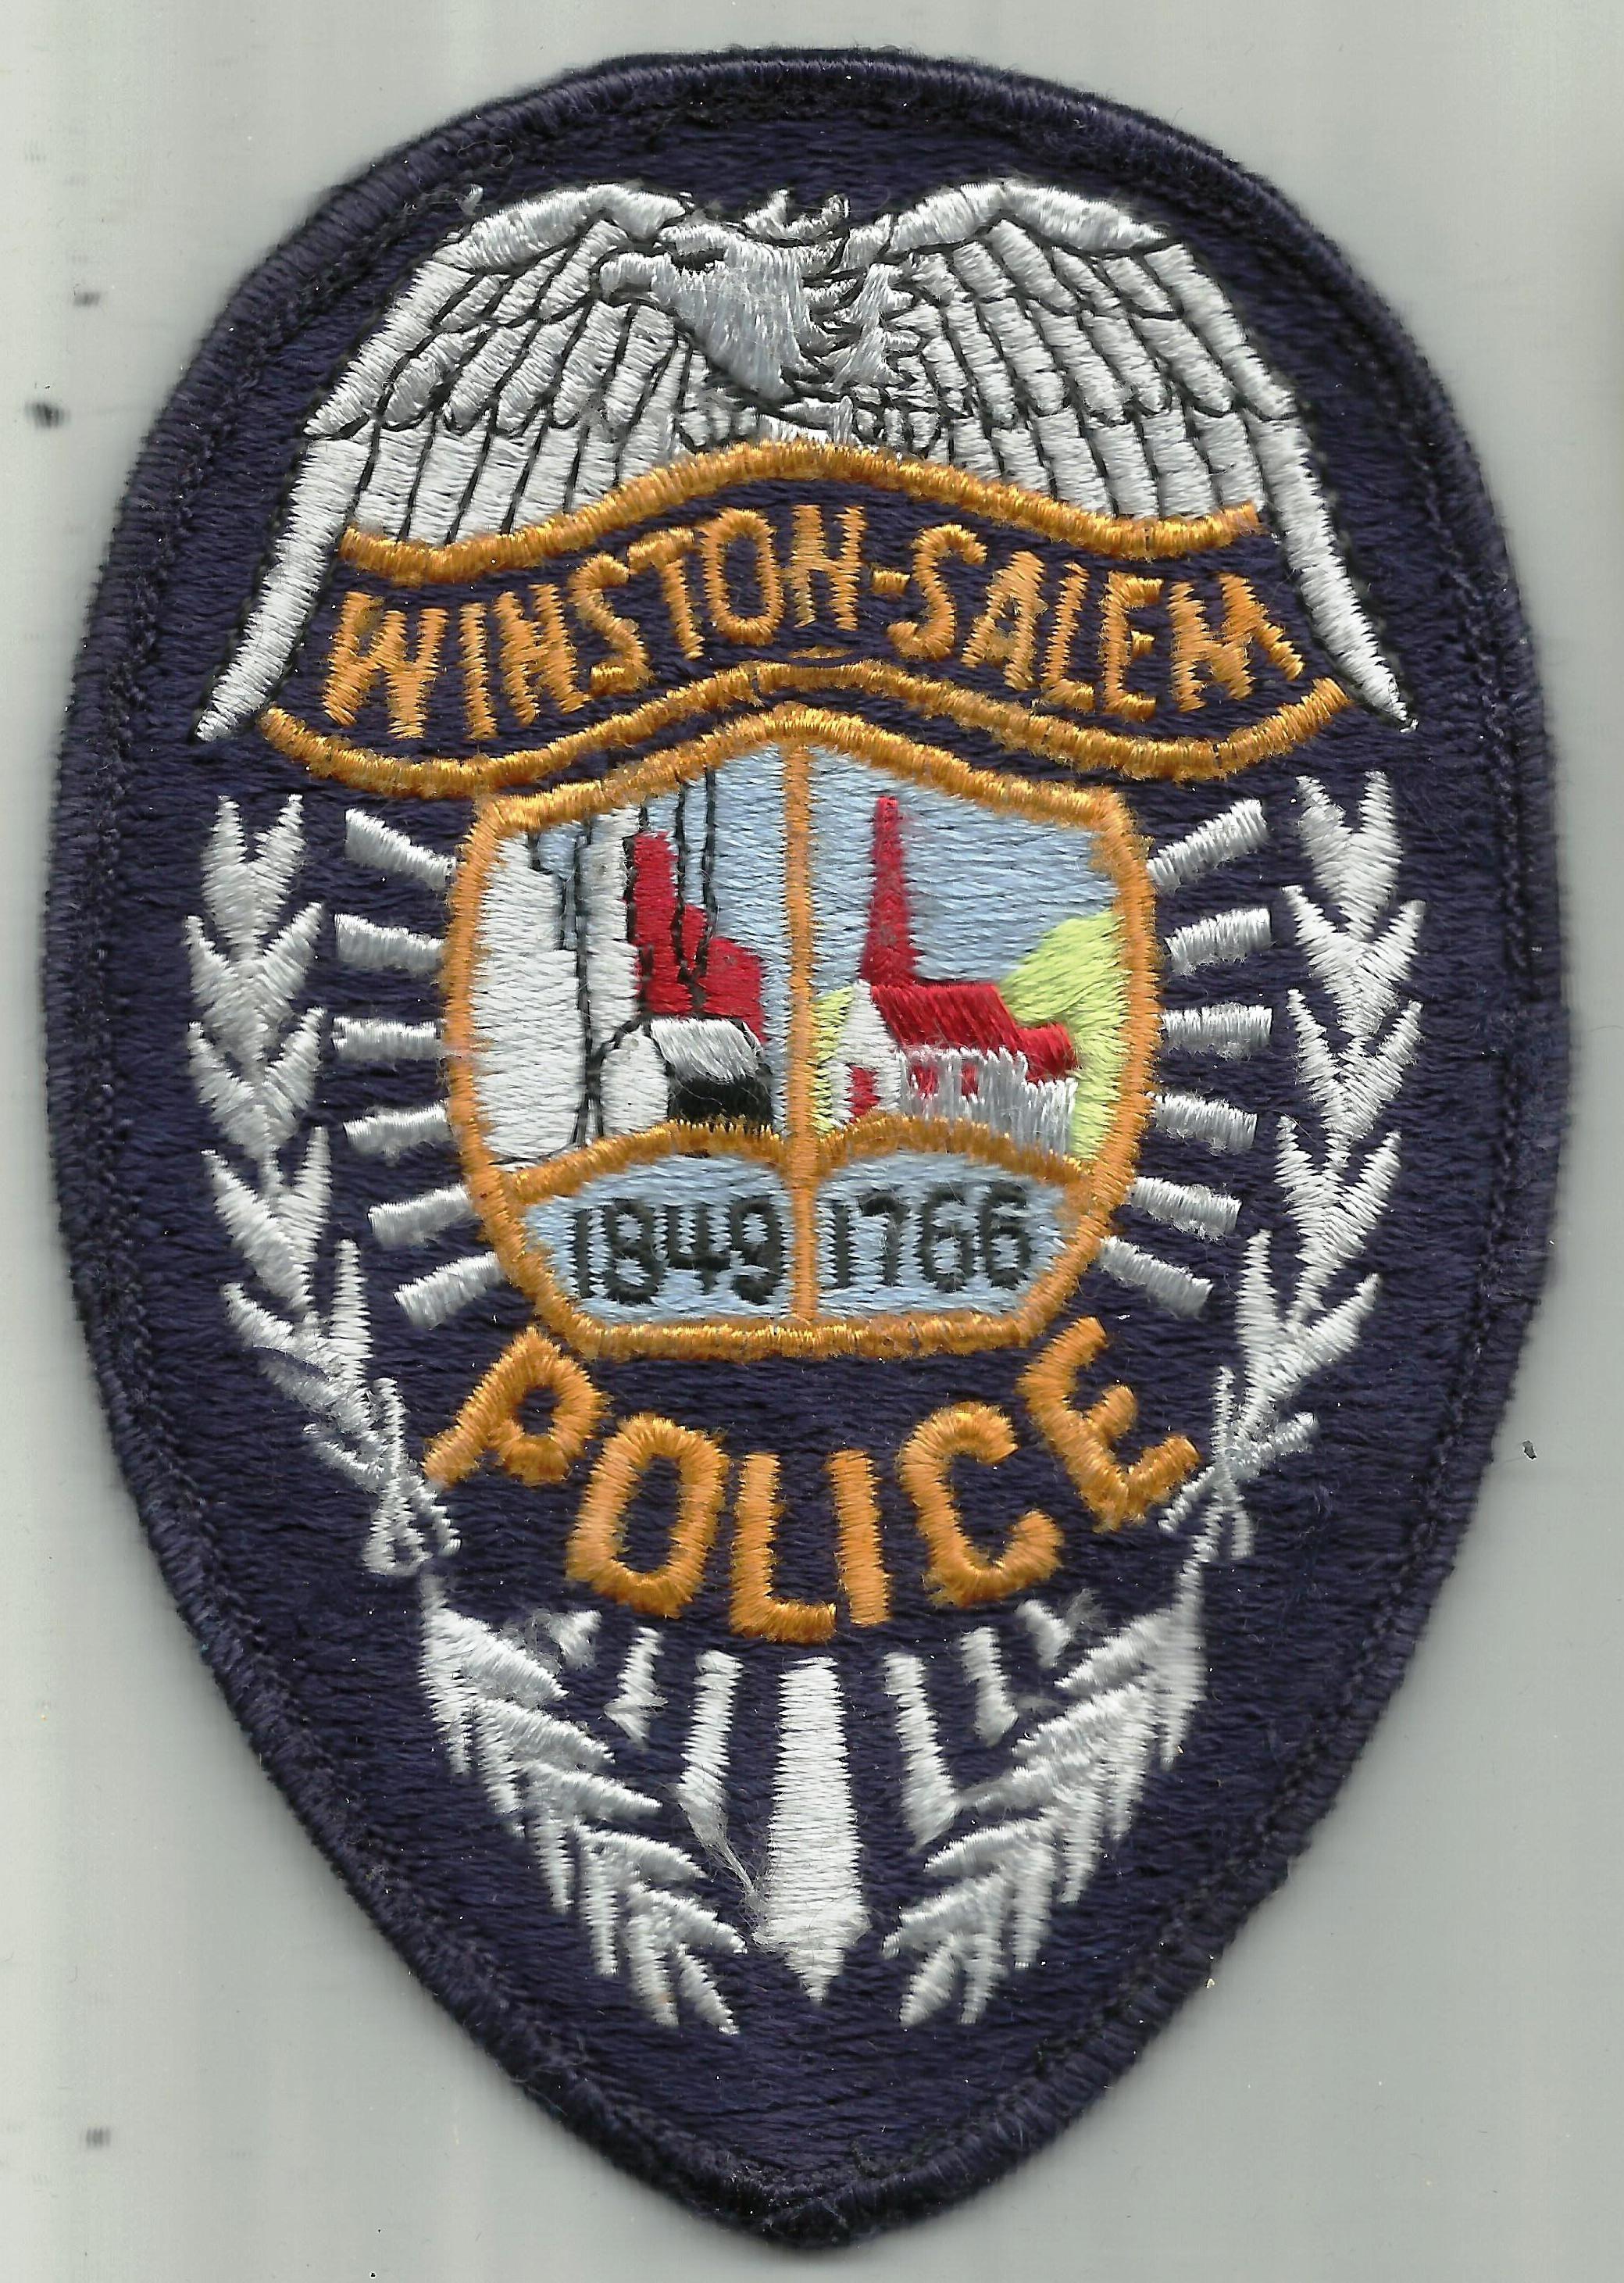 Us State Of North Carolina City Of Winston Salem Police Department Cloth Badge Cloth Badges Police Badge Badge